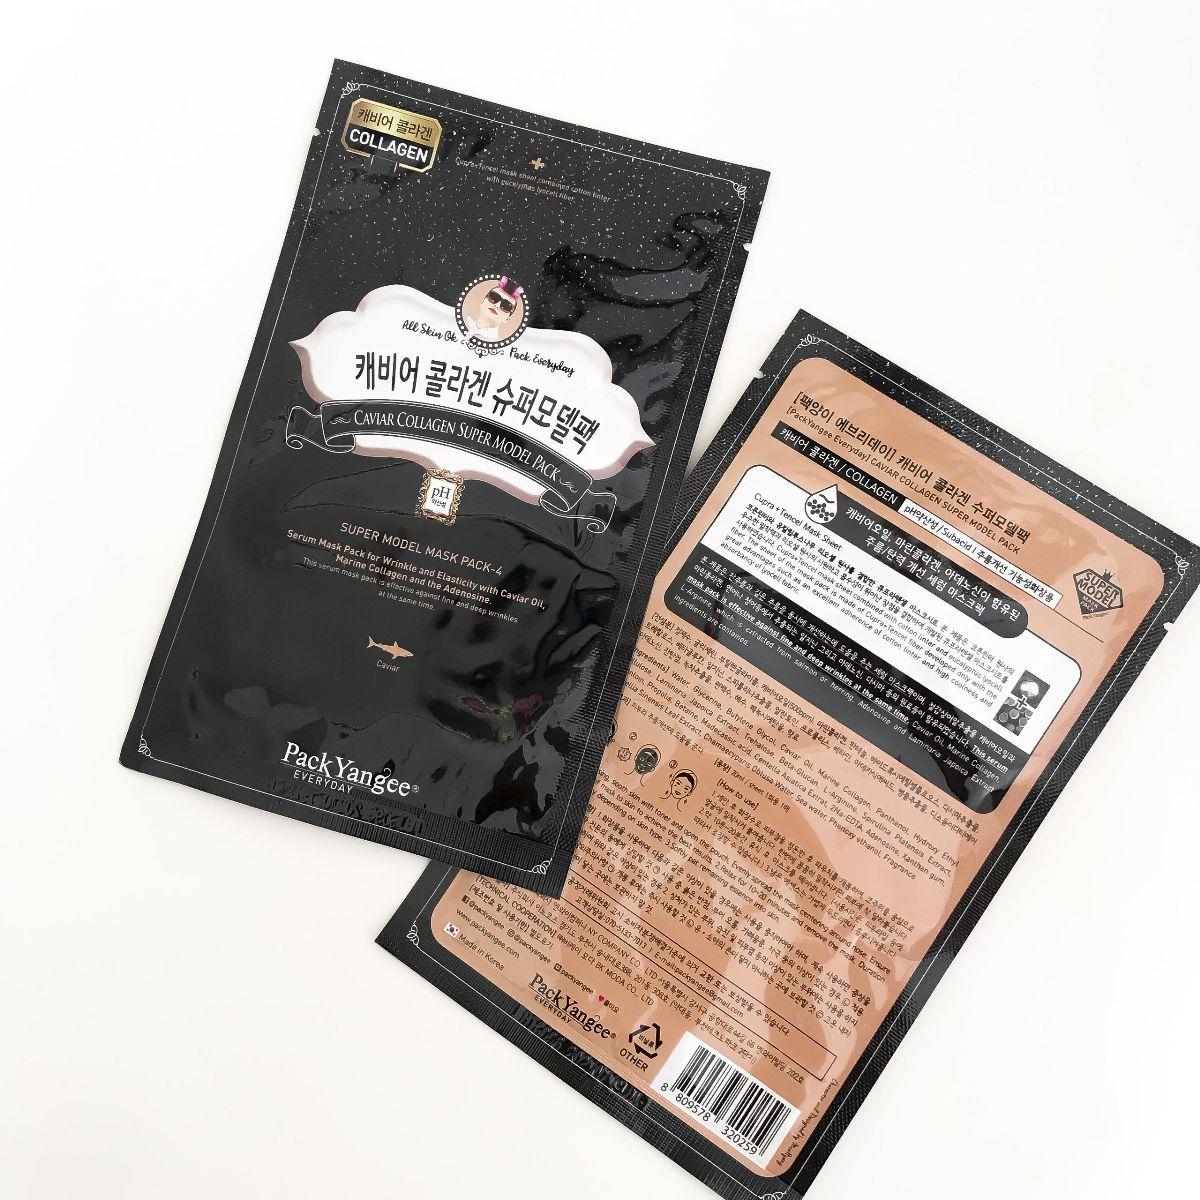 Mat-Na-Caviar-Collagen-Super-Model-Pack-3